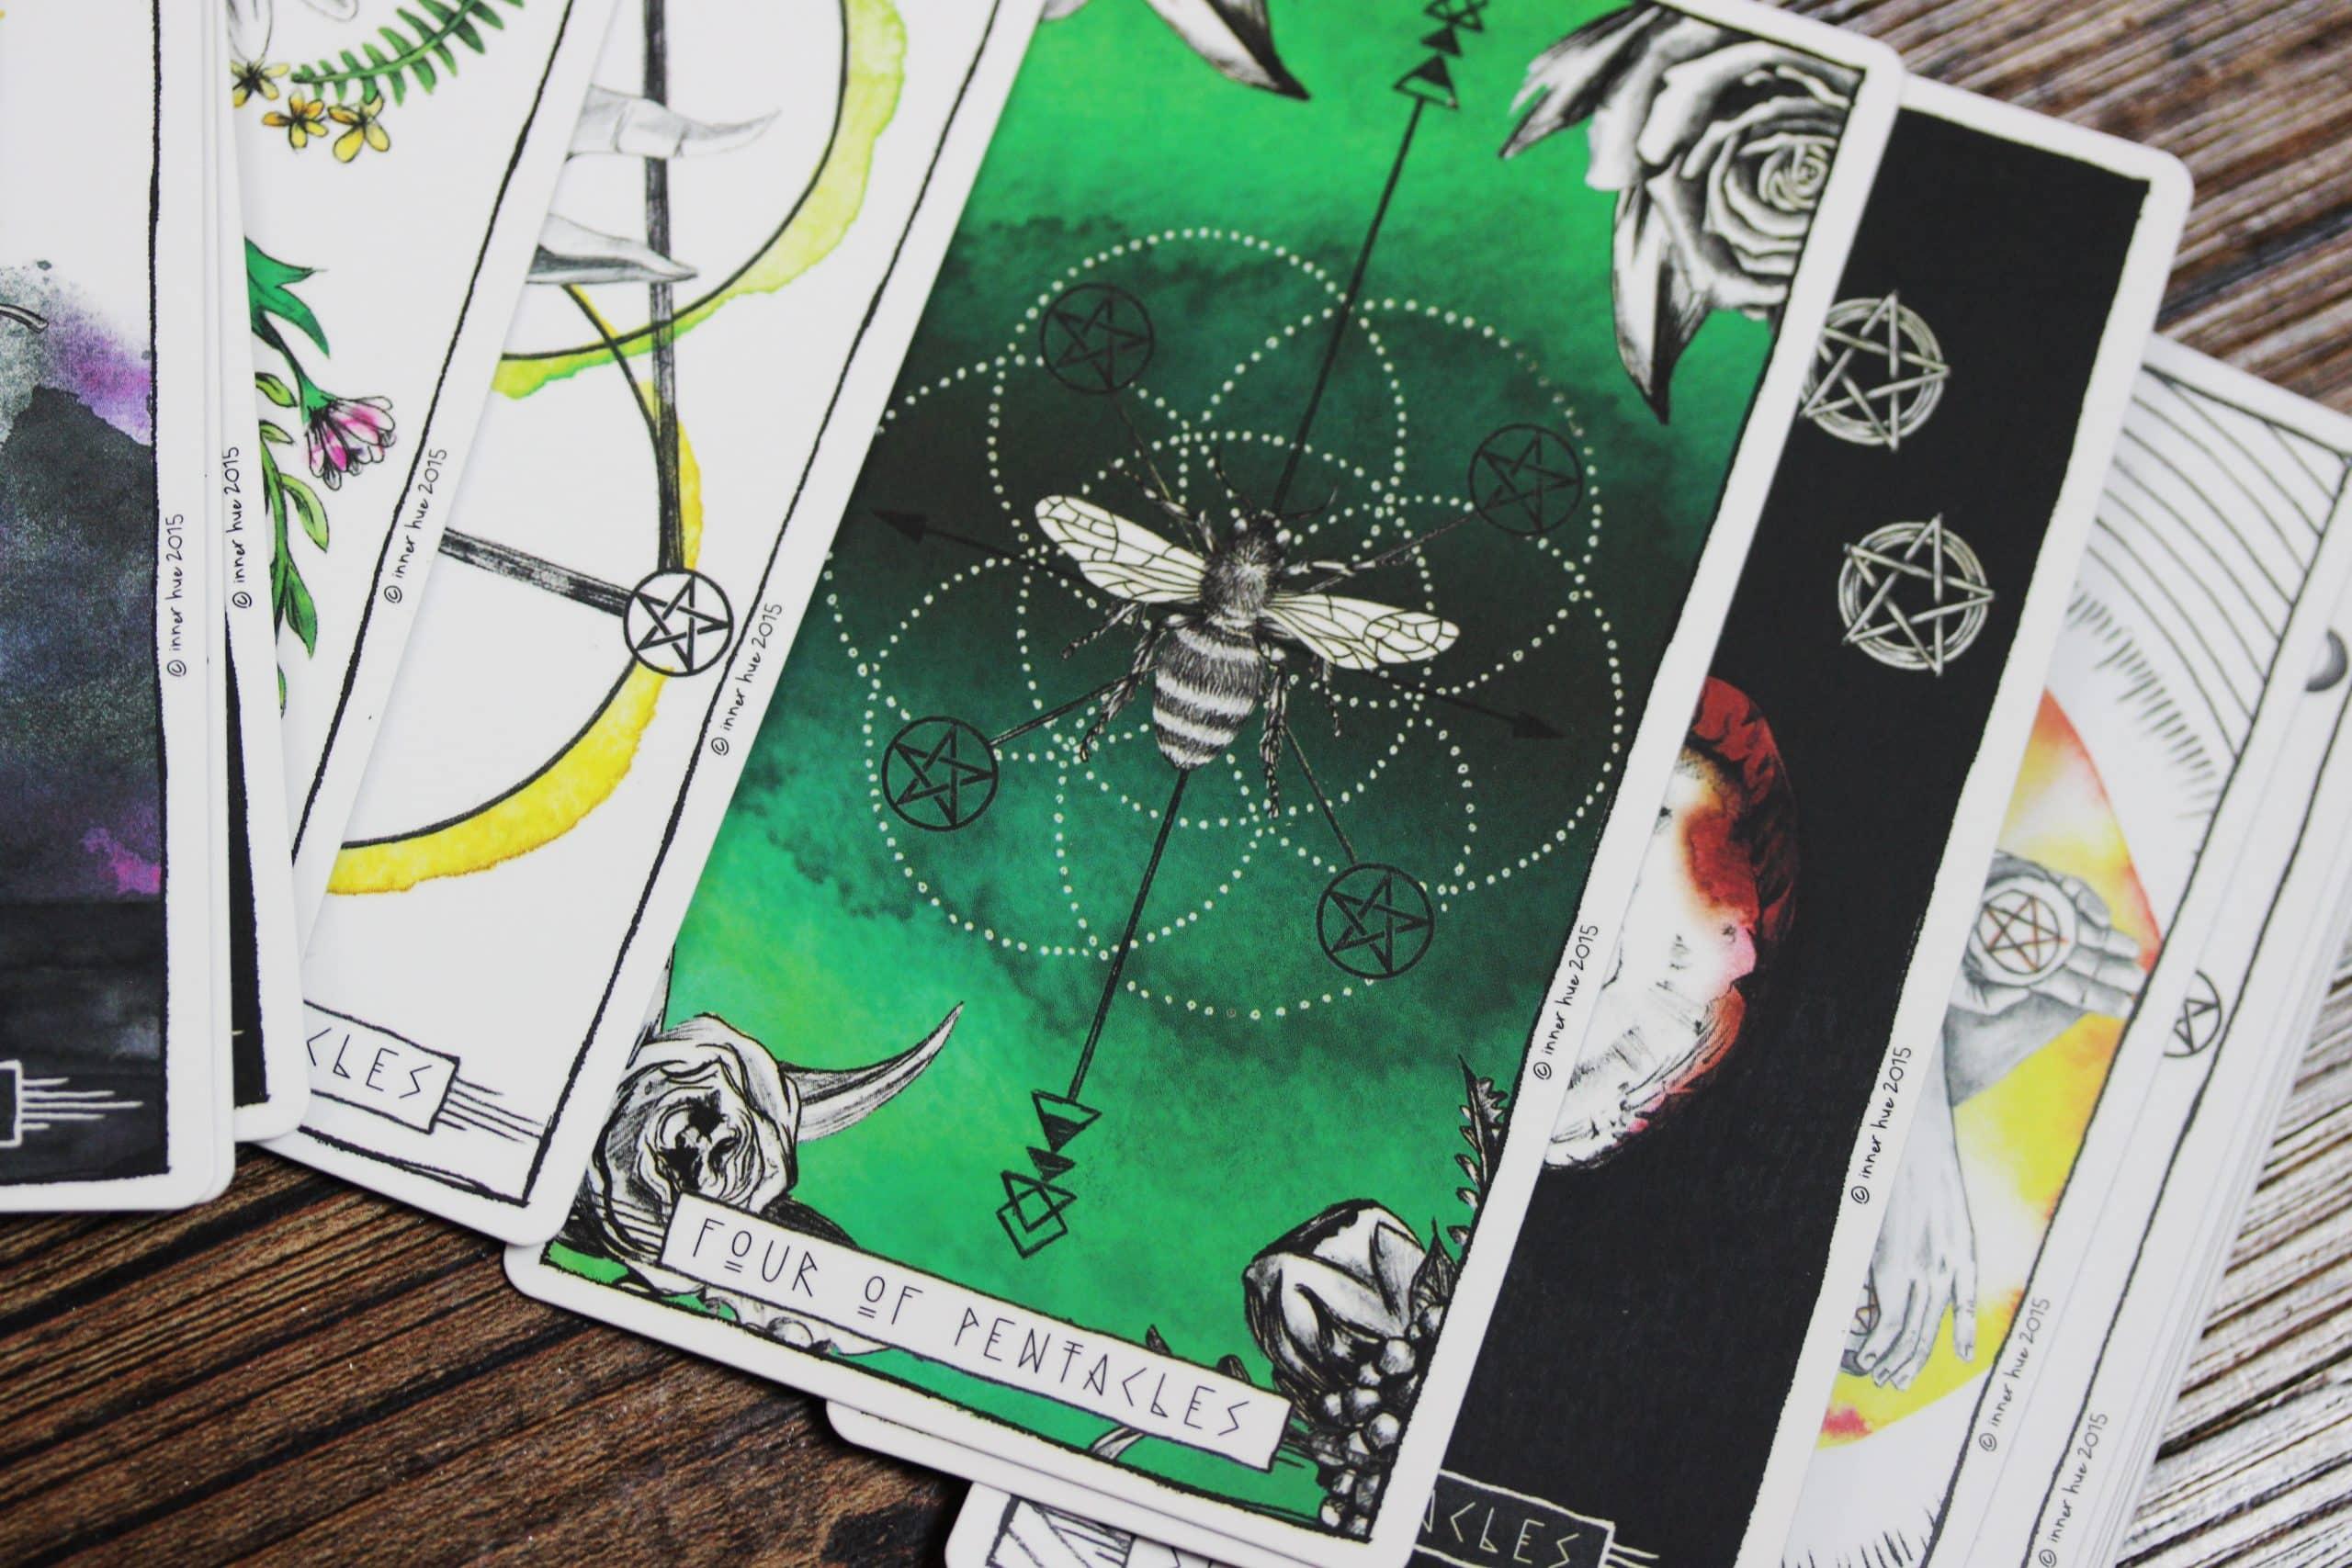 pentagram pentakels op tarot kaart